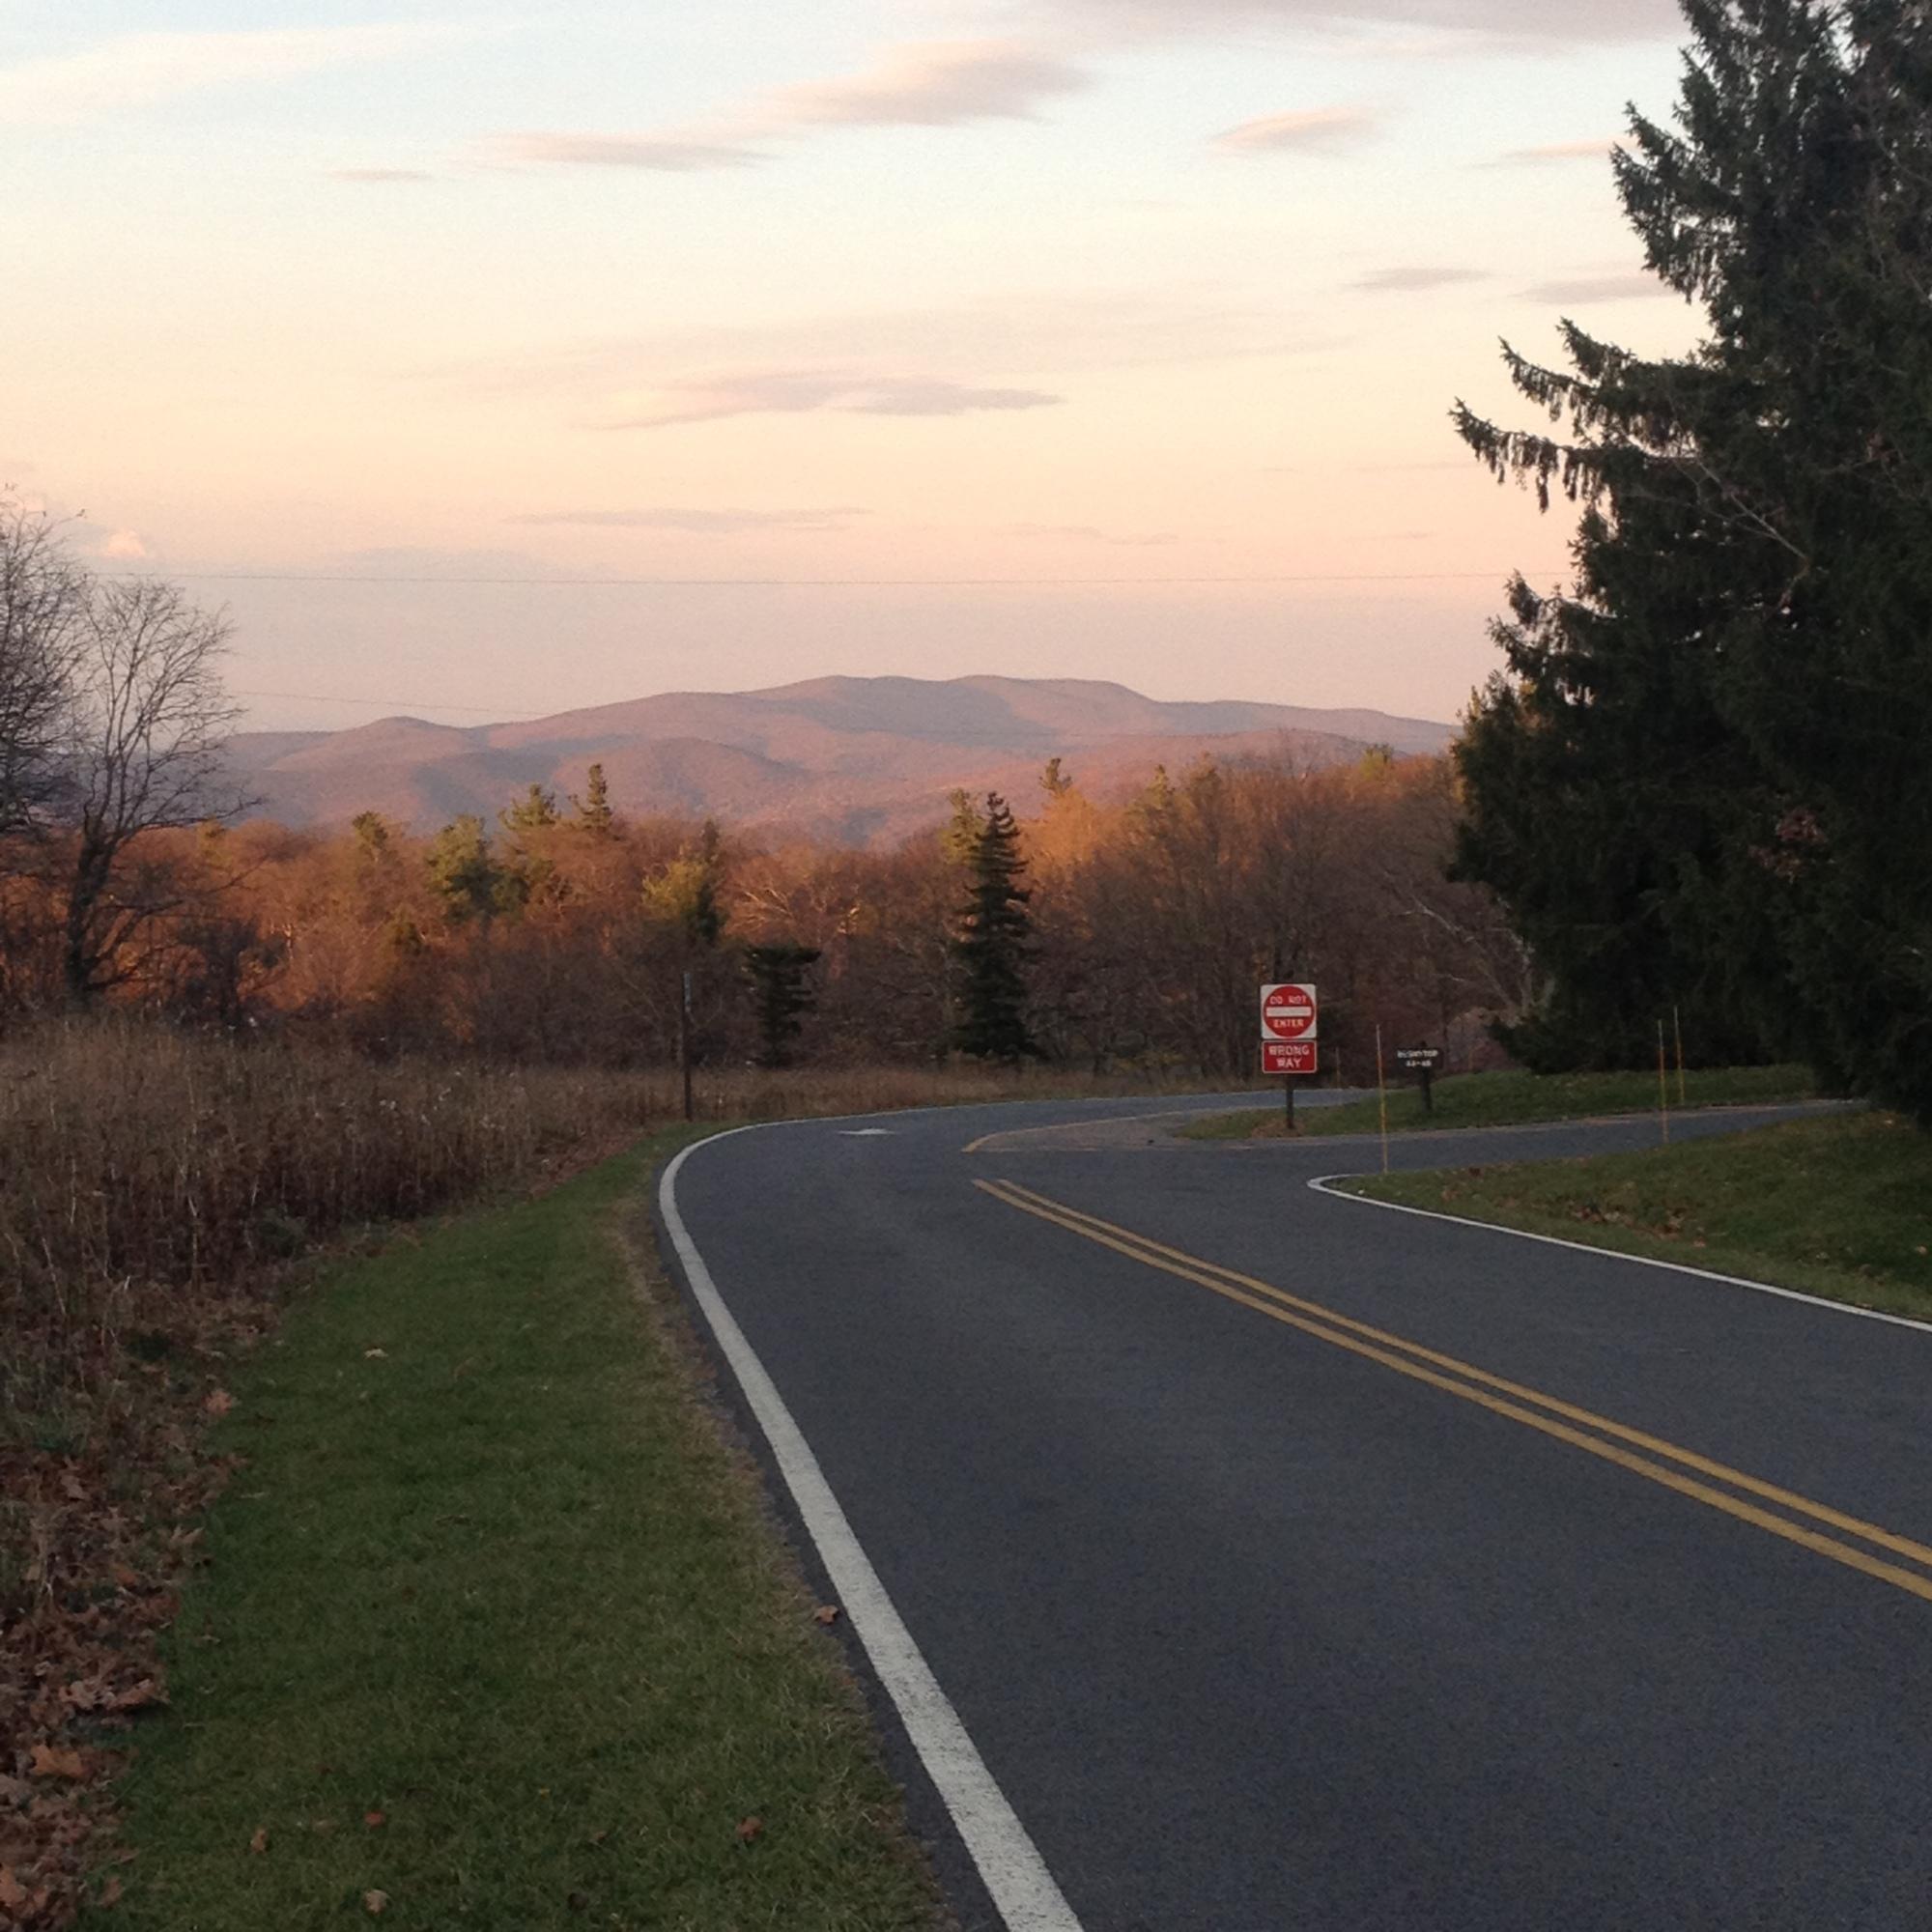 Shenandoah National Park, Skyline Drive, Fall, Road